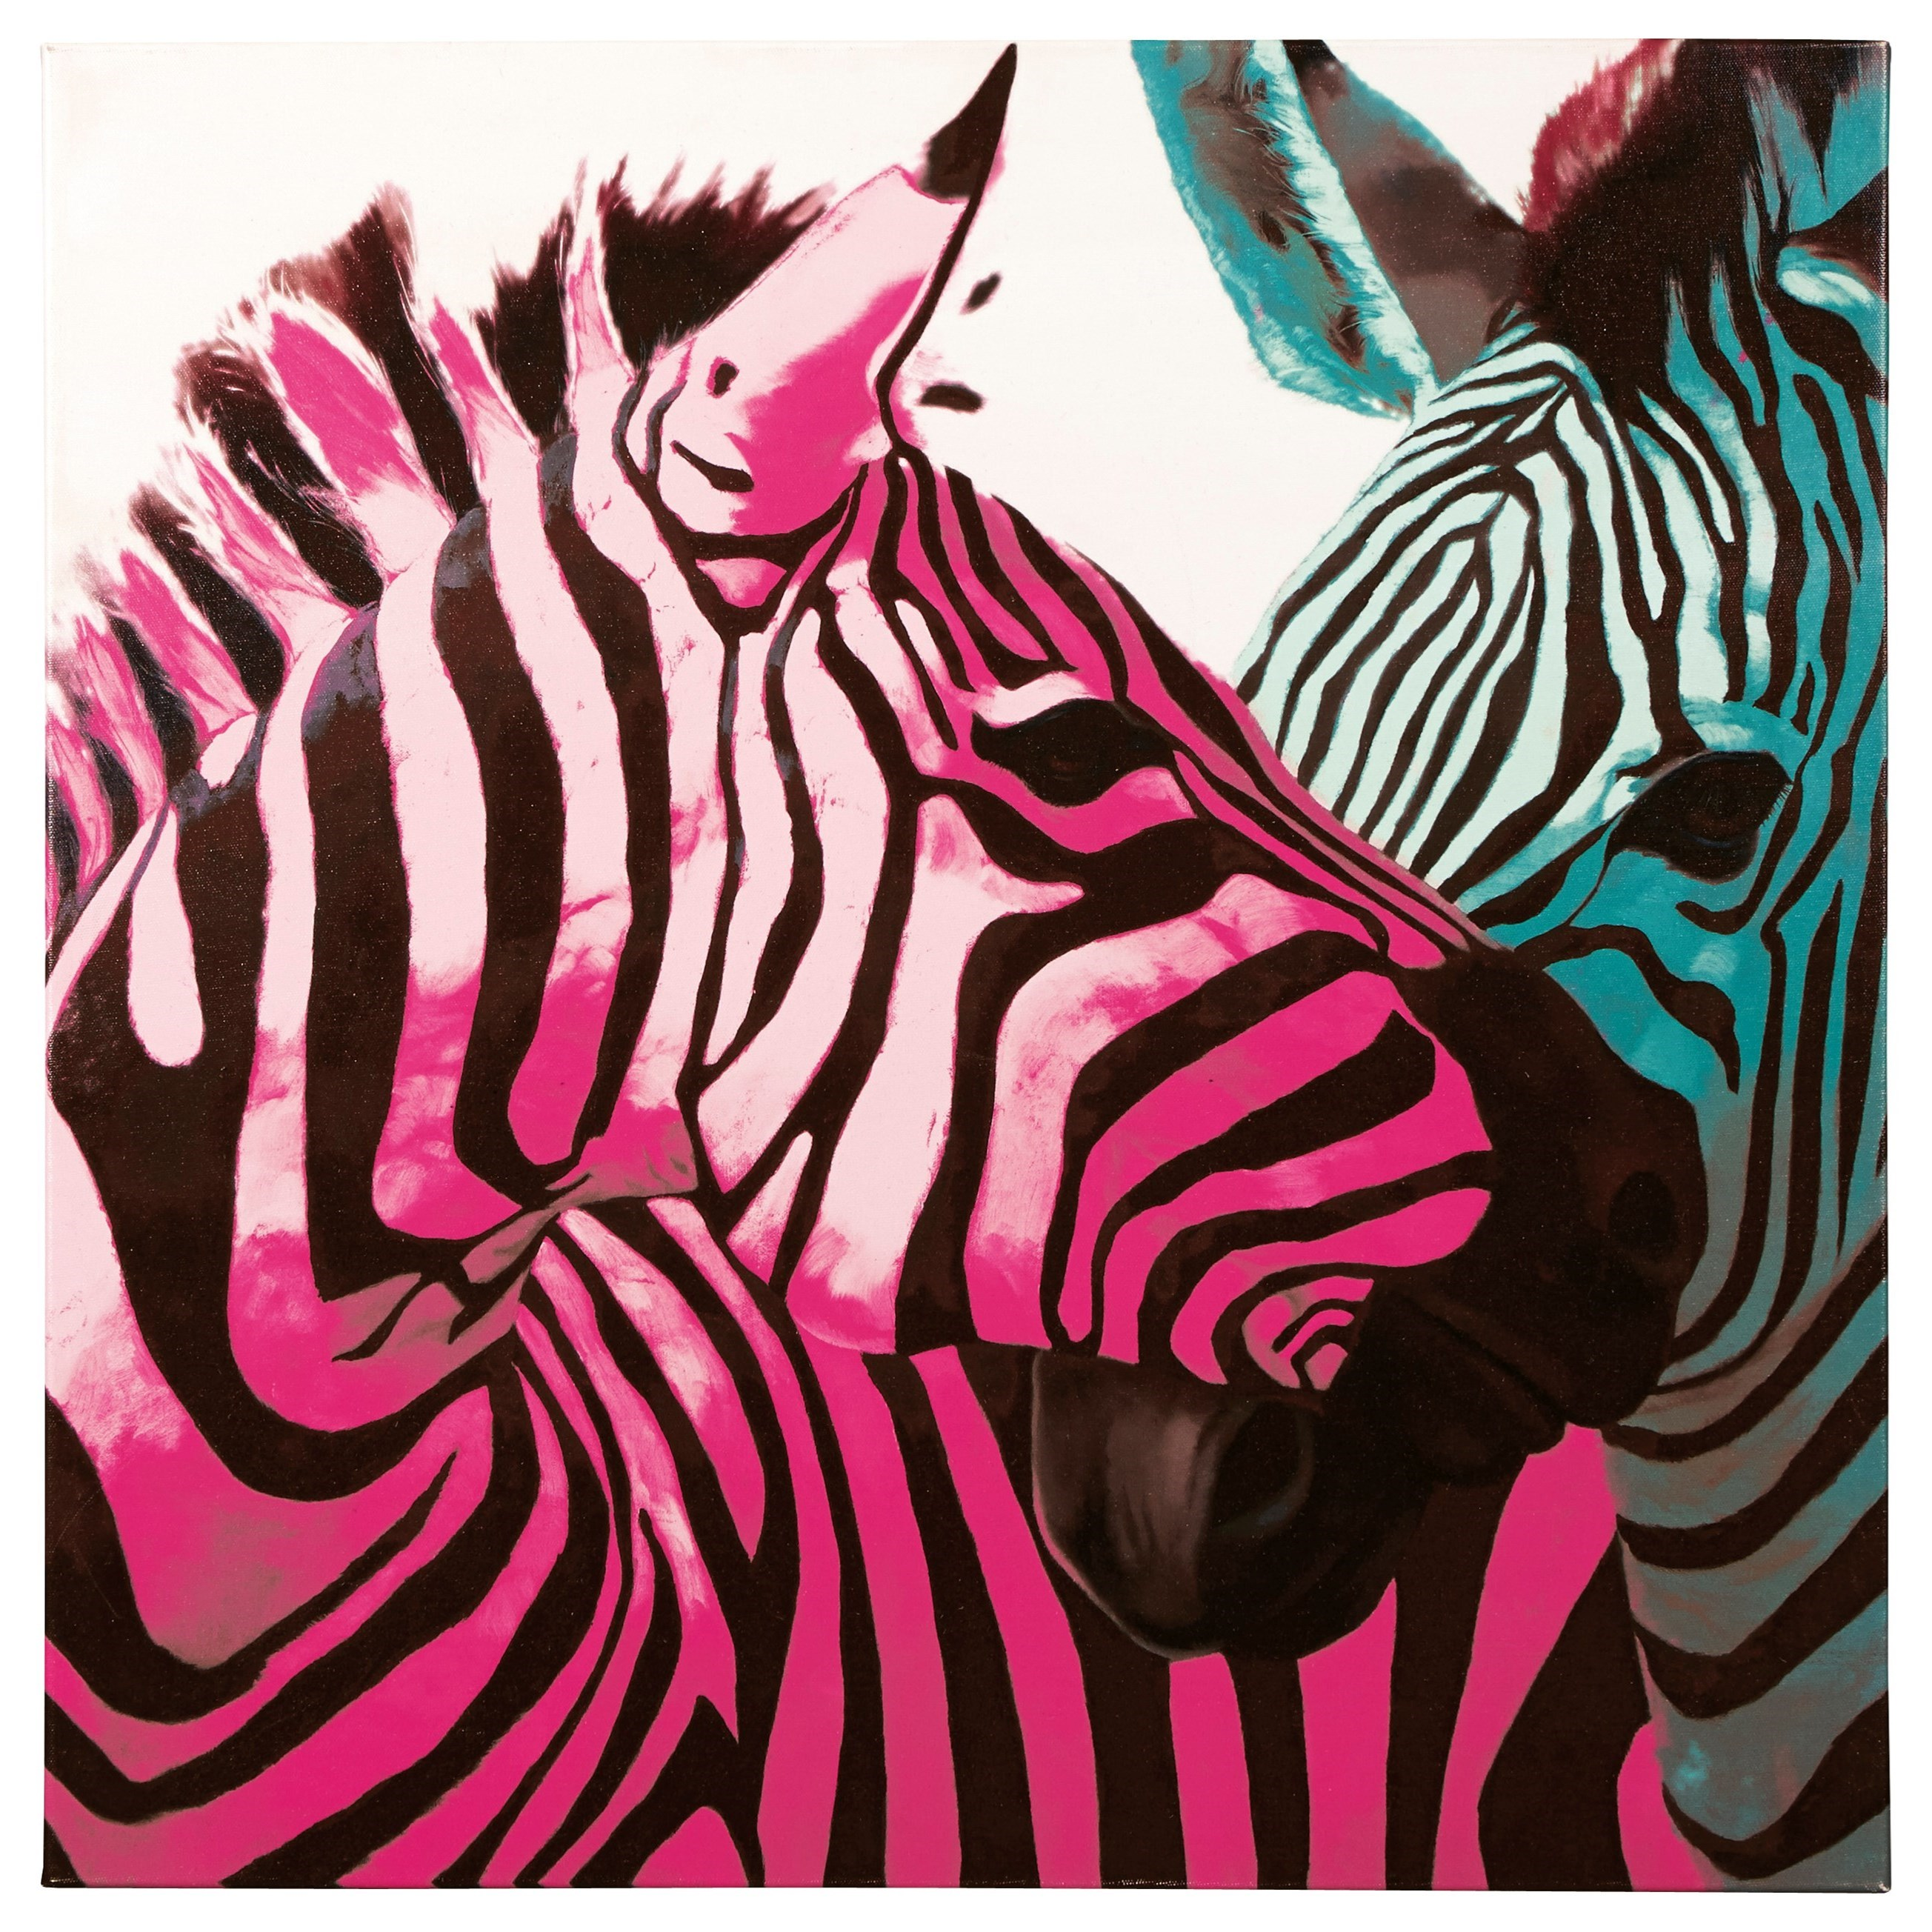 Signature Design by Ashley Wall Art Jabbar Multi Wall Art - Item Number: A8000170